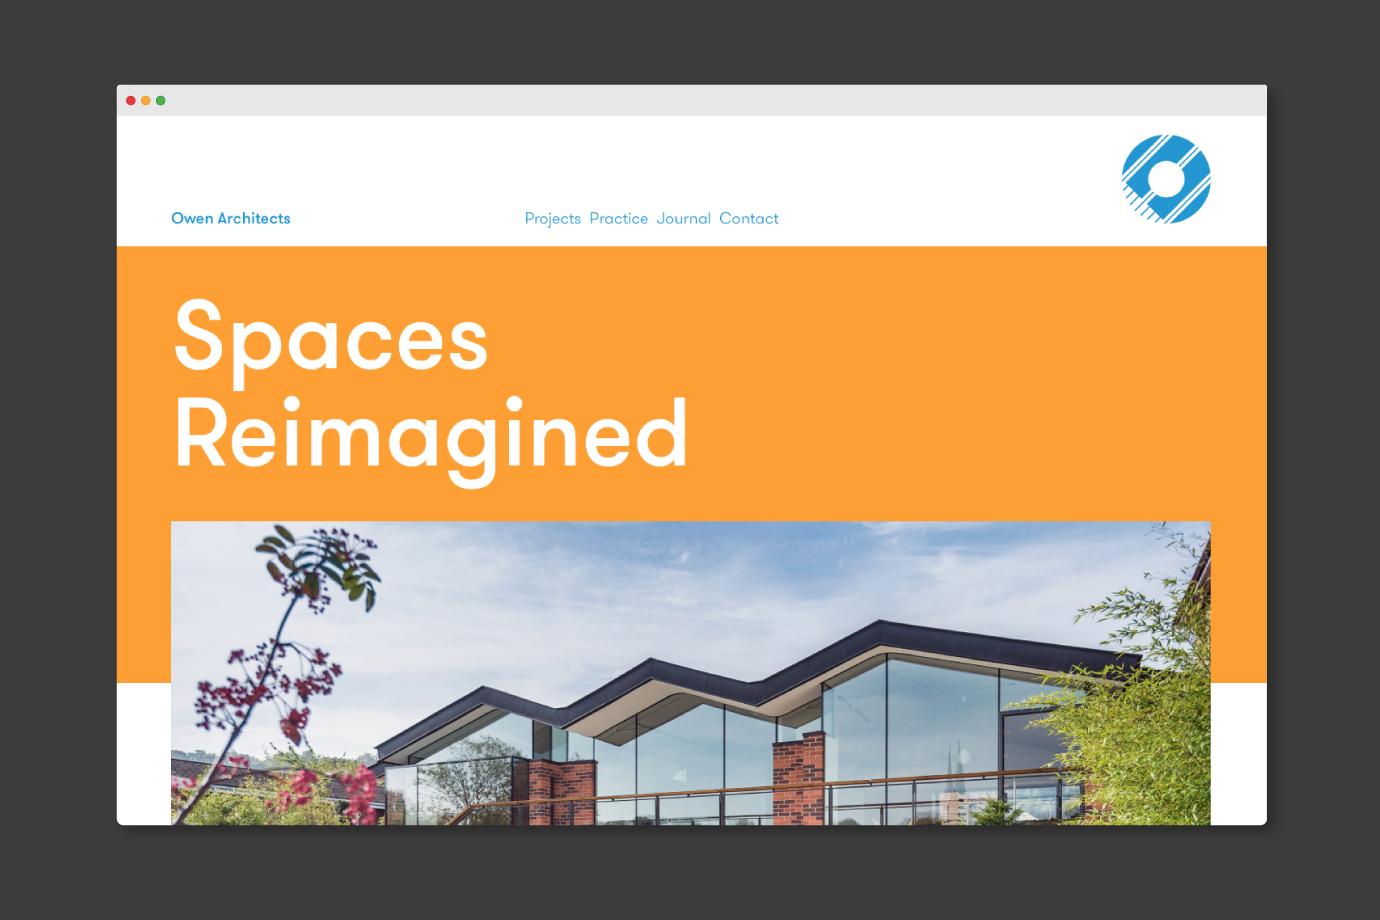 https://spystudio.co.uk/wp-content/uploads/2017/03/Owen_Architects_web-1.jpg